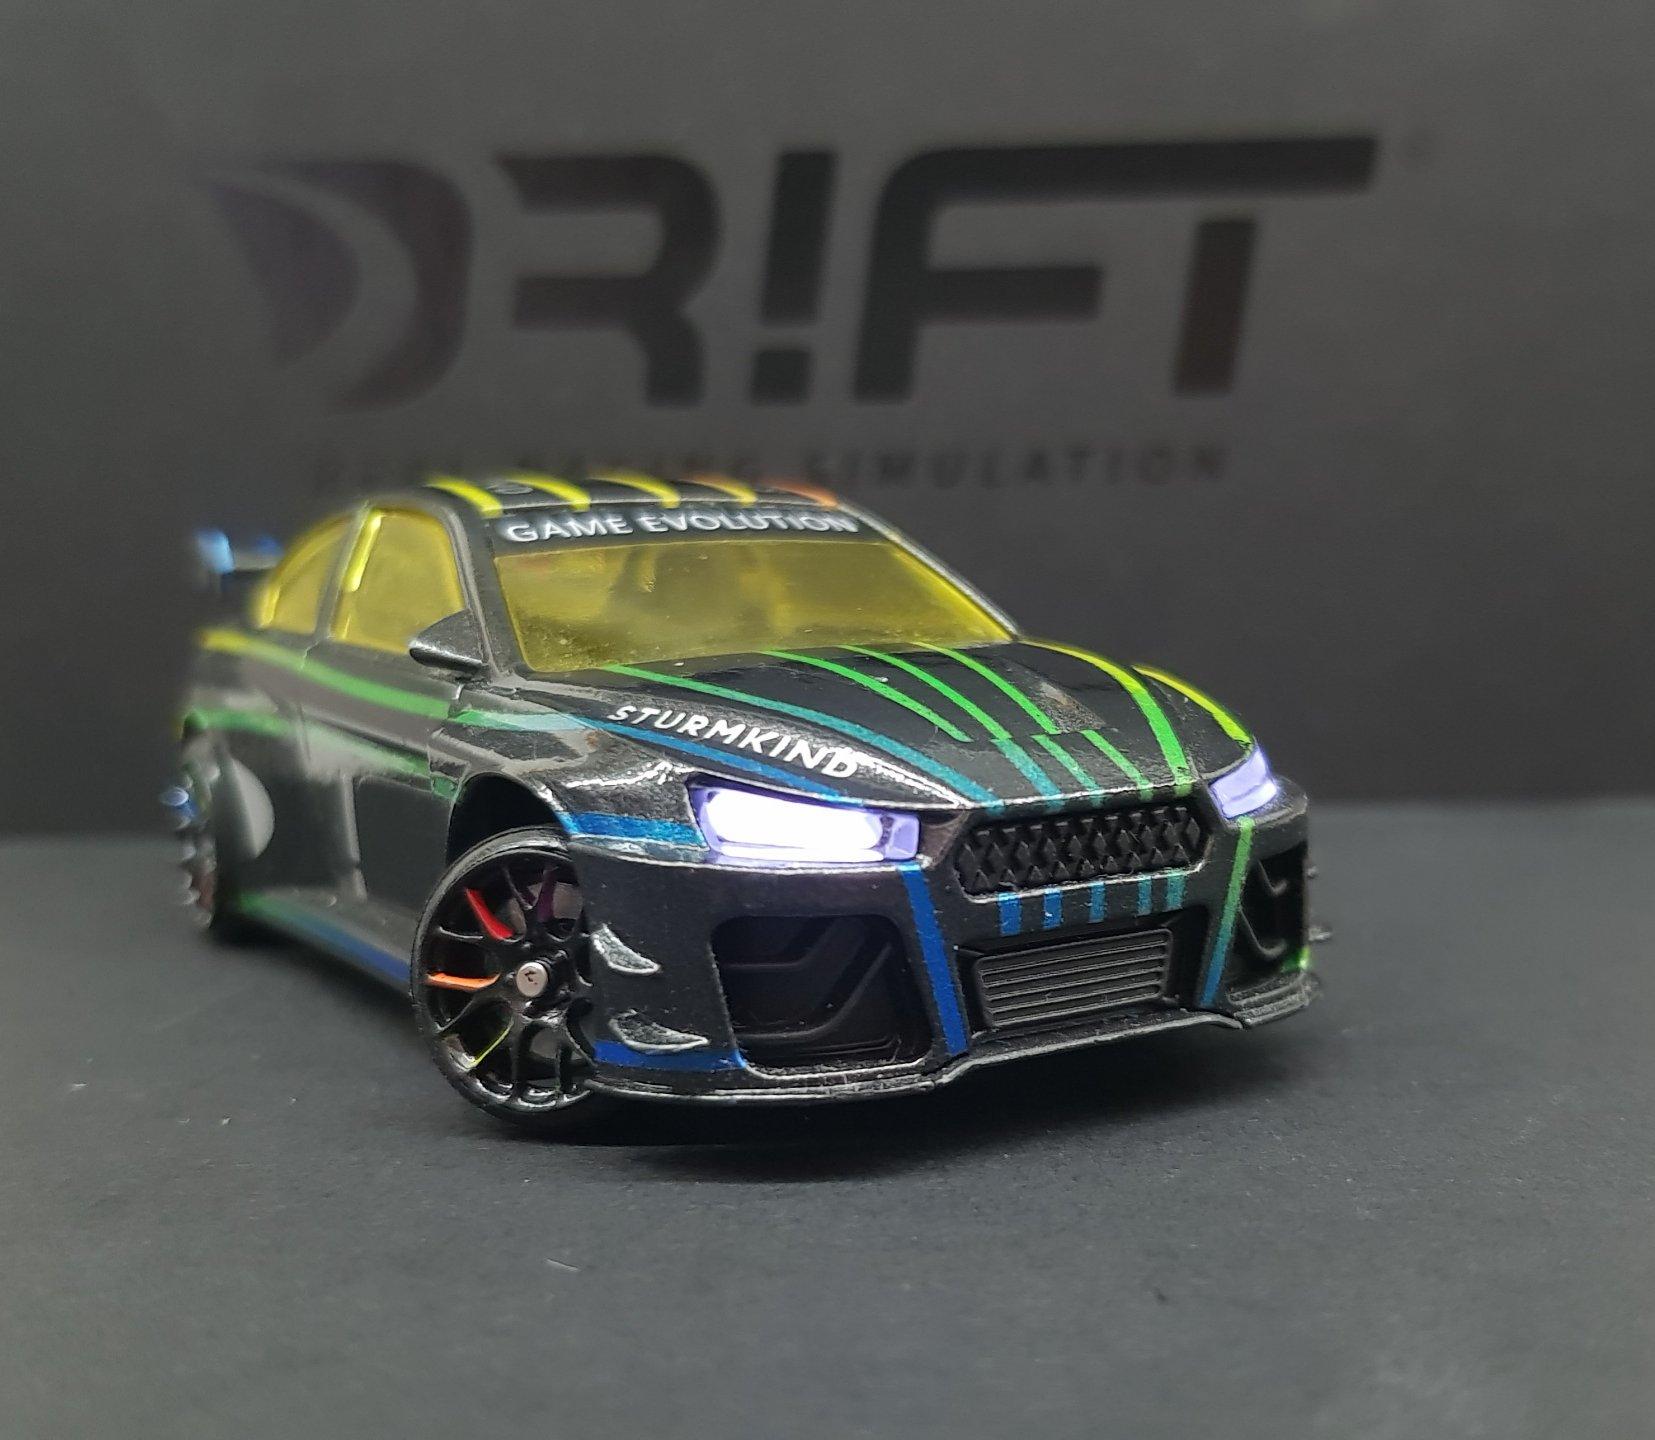 DR!FT-Racer